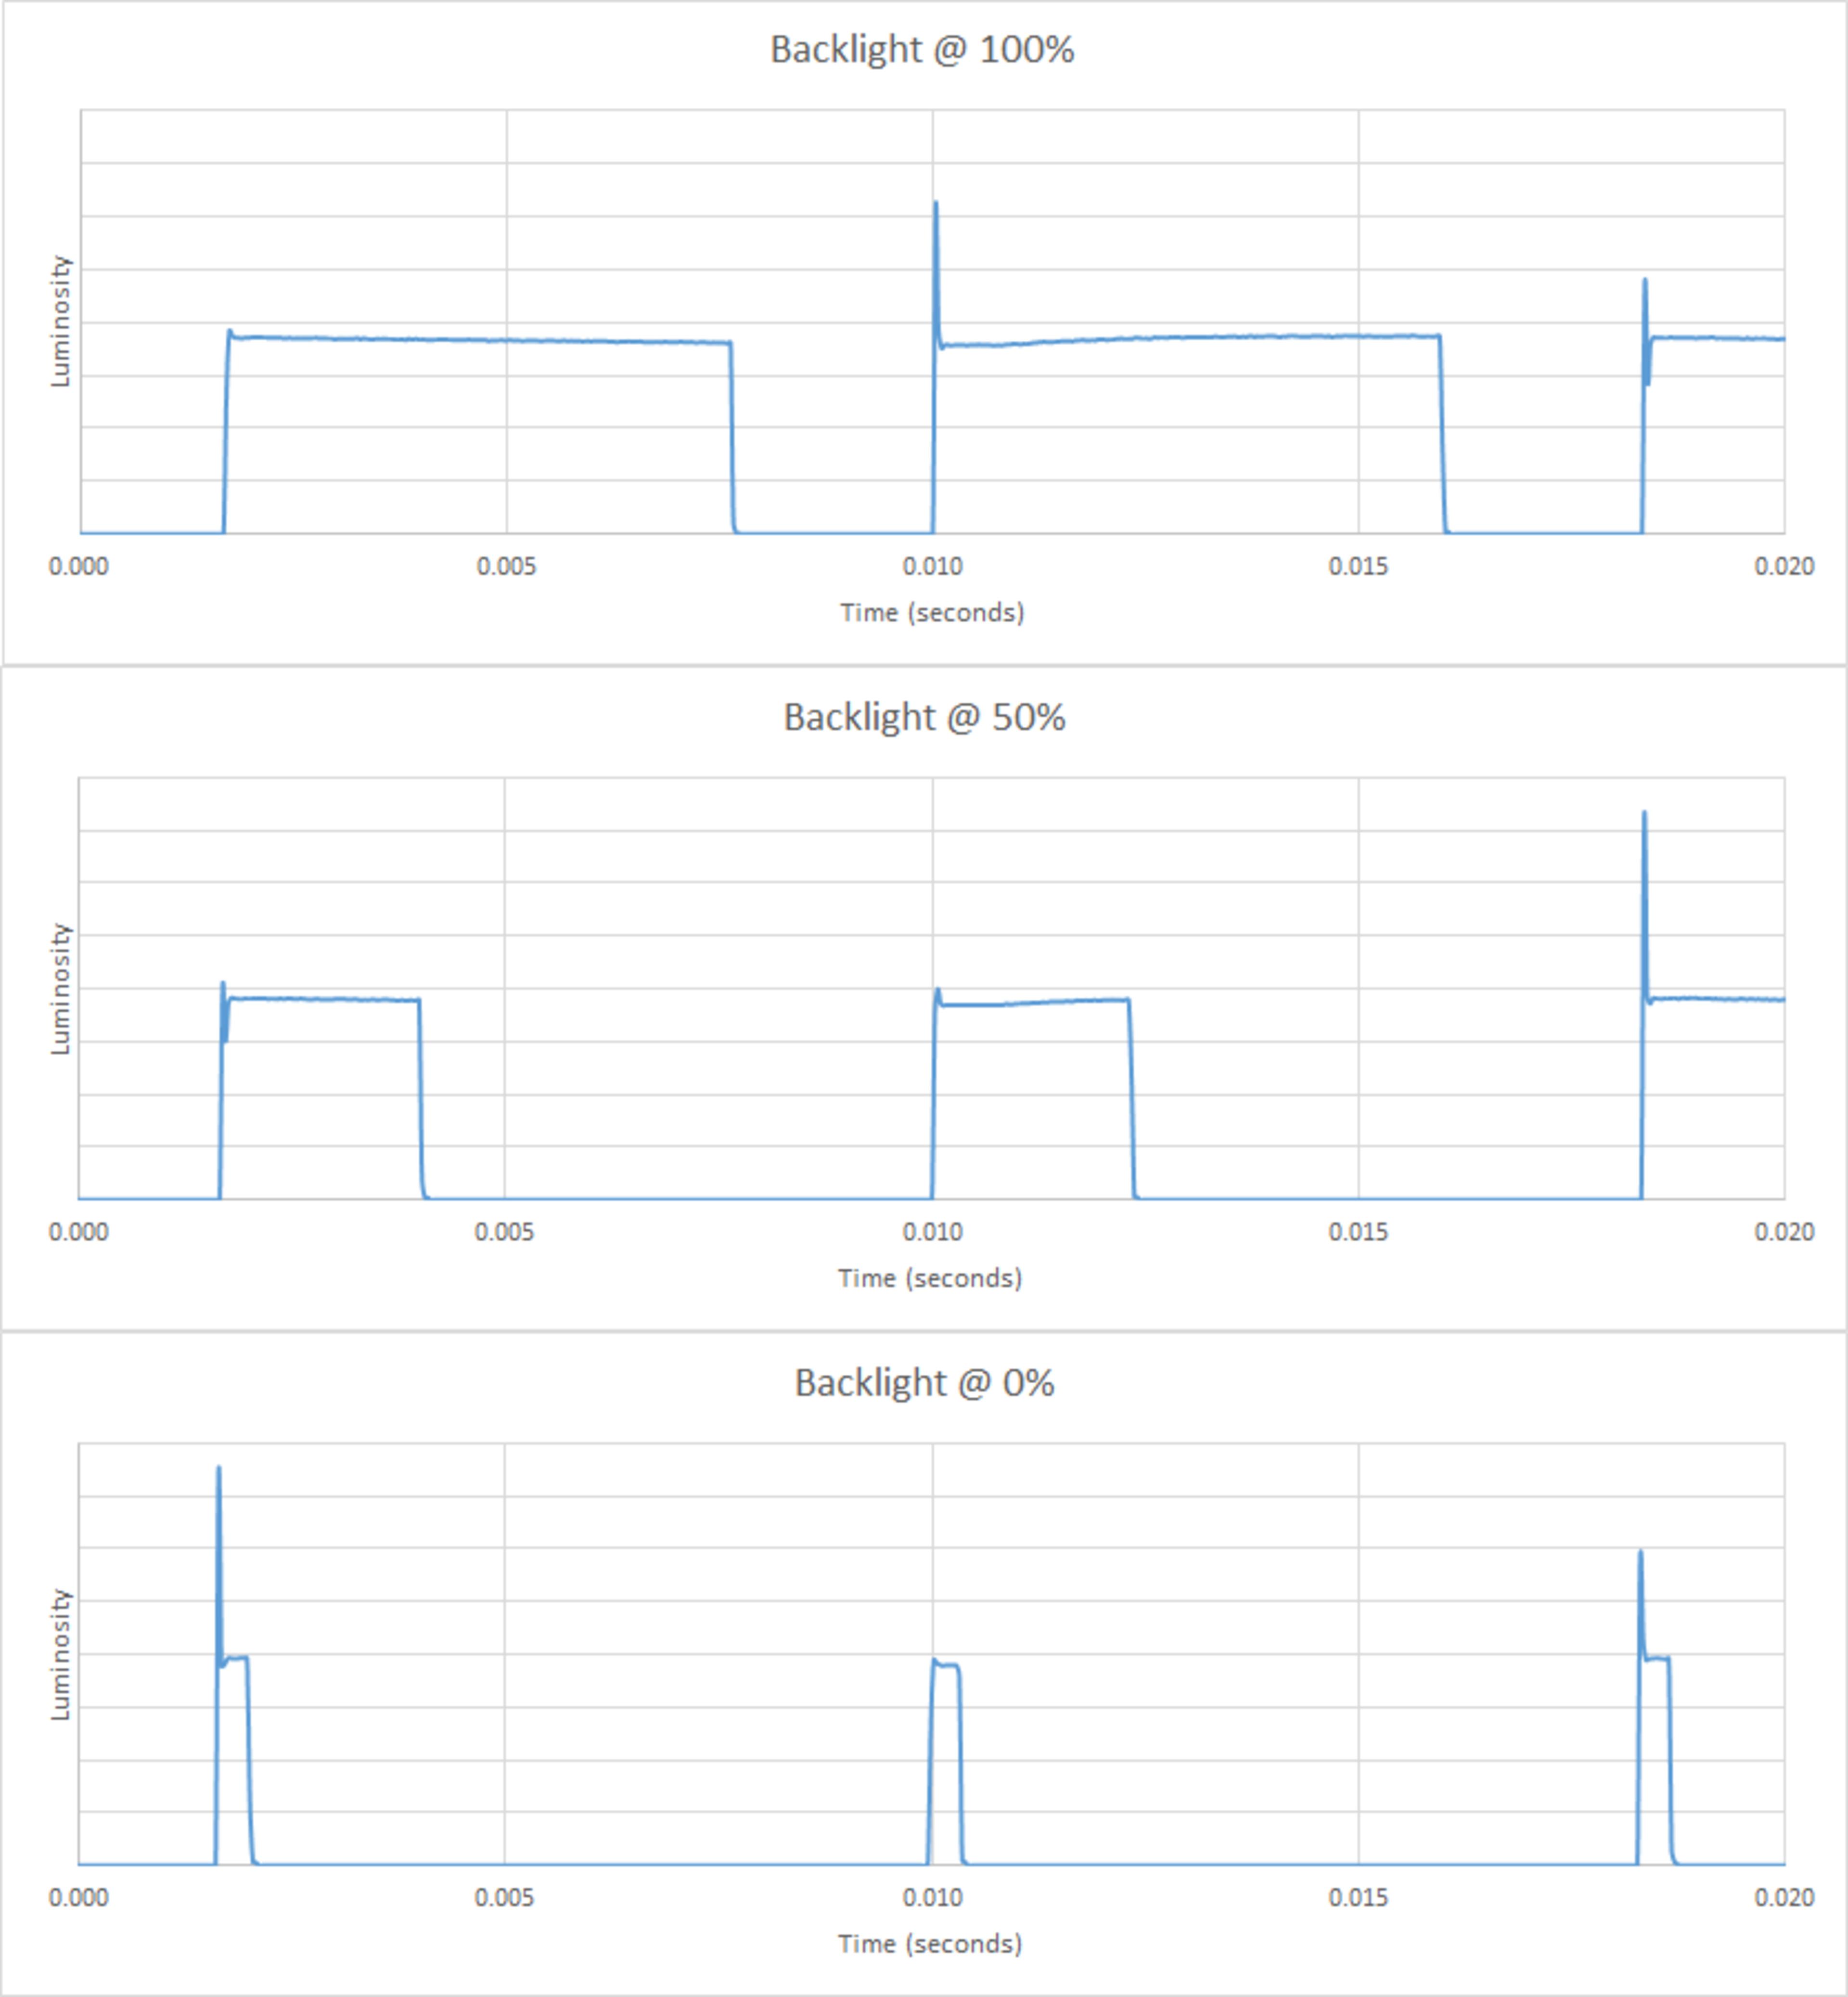 LG UK6300 Review (43UK6300, 49UK6300, 50UK6300, 55UK6300